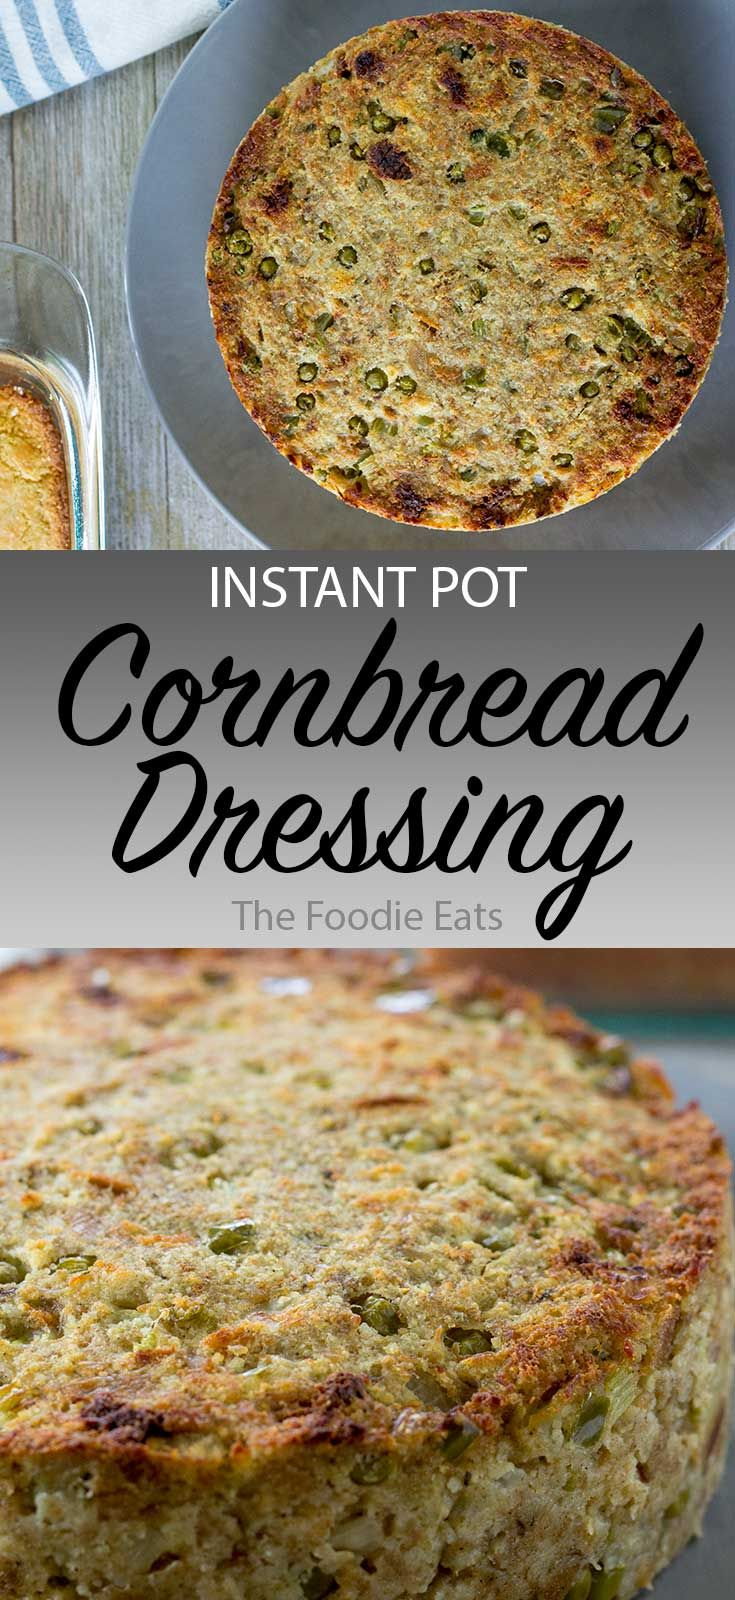 Instant Pot Stuffing AKA Cornbread Dressing | The Foodie Eats